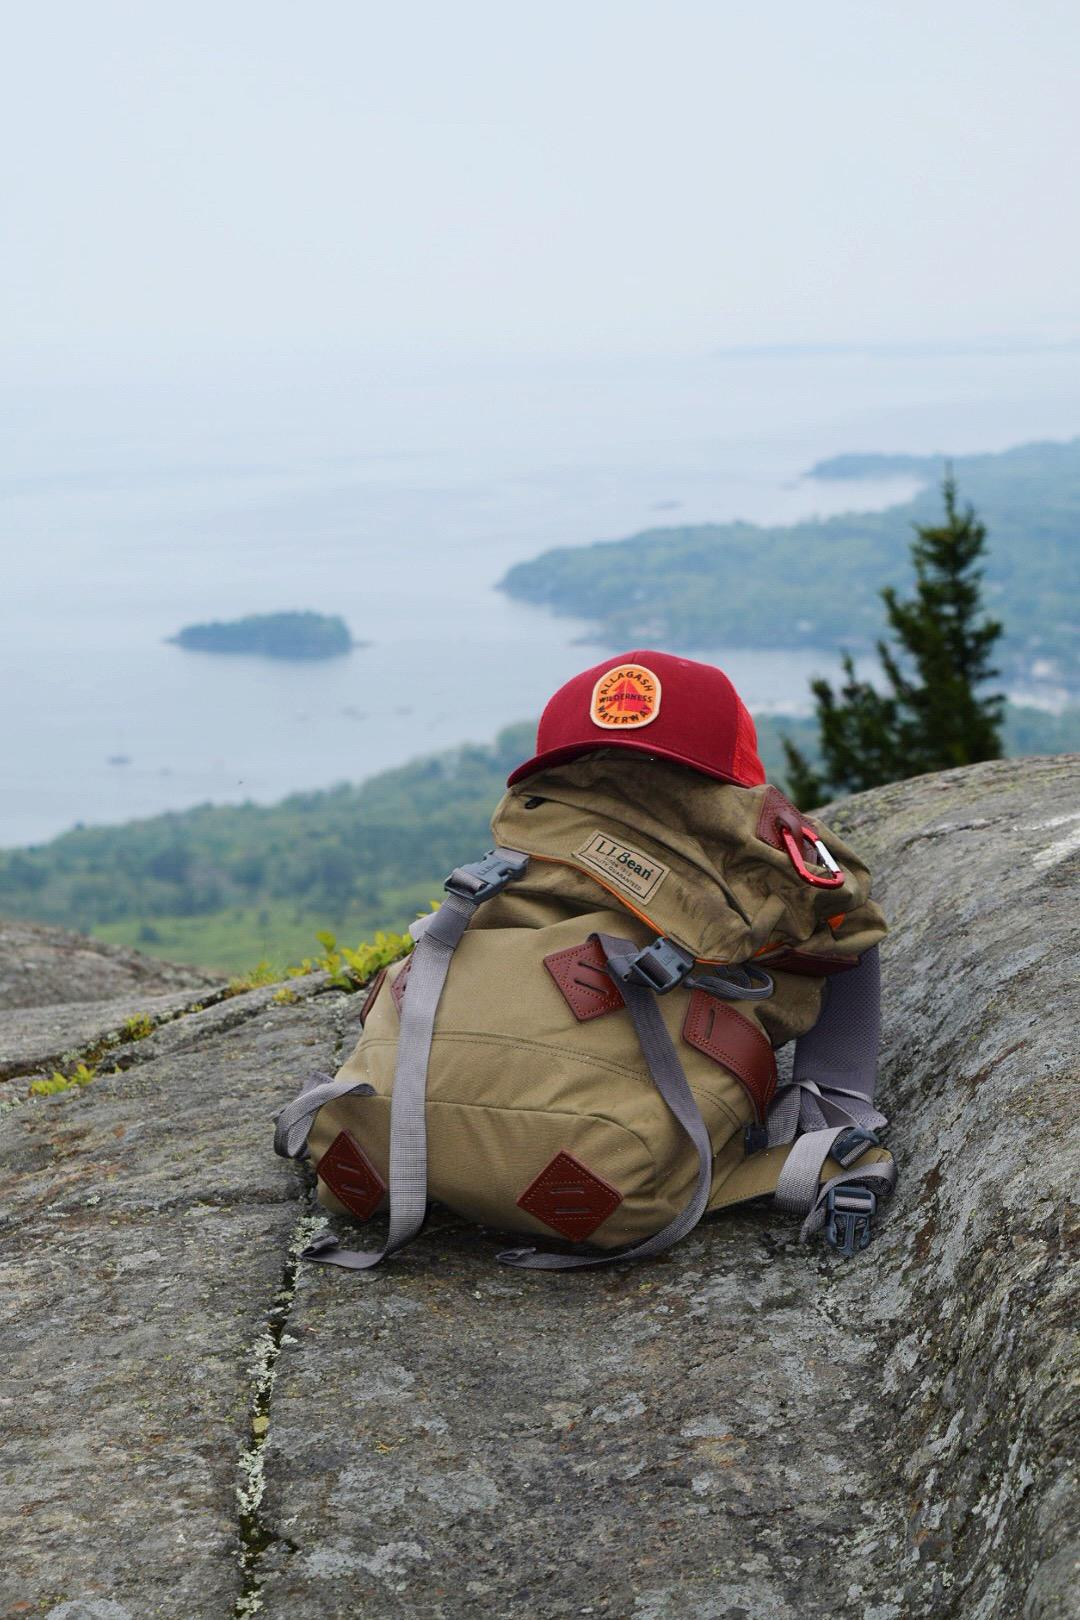 Hiking Gear | Camden, Maine